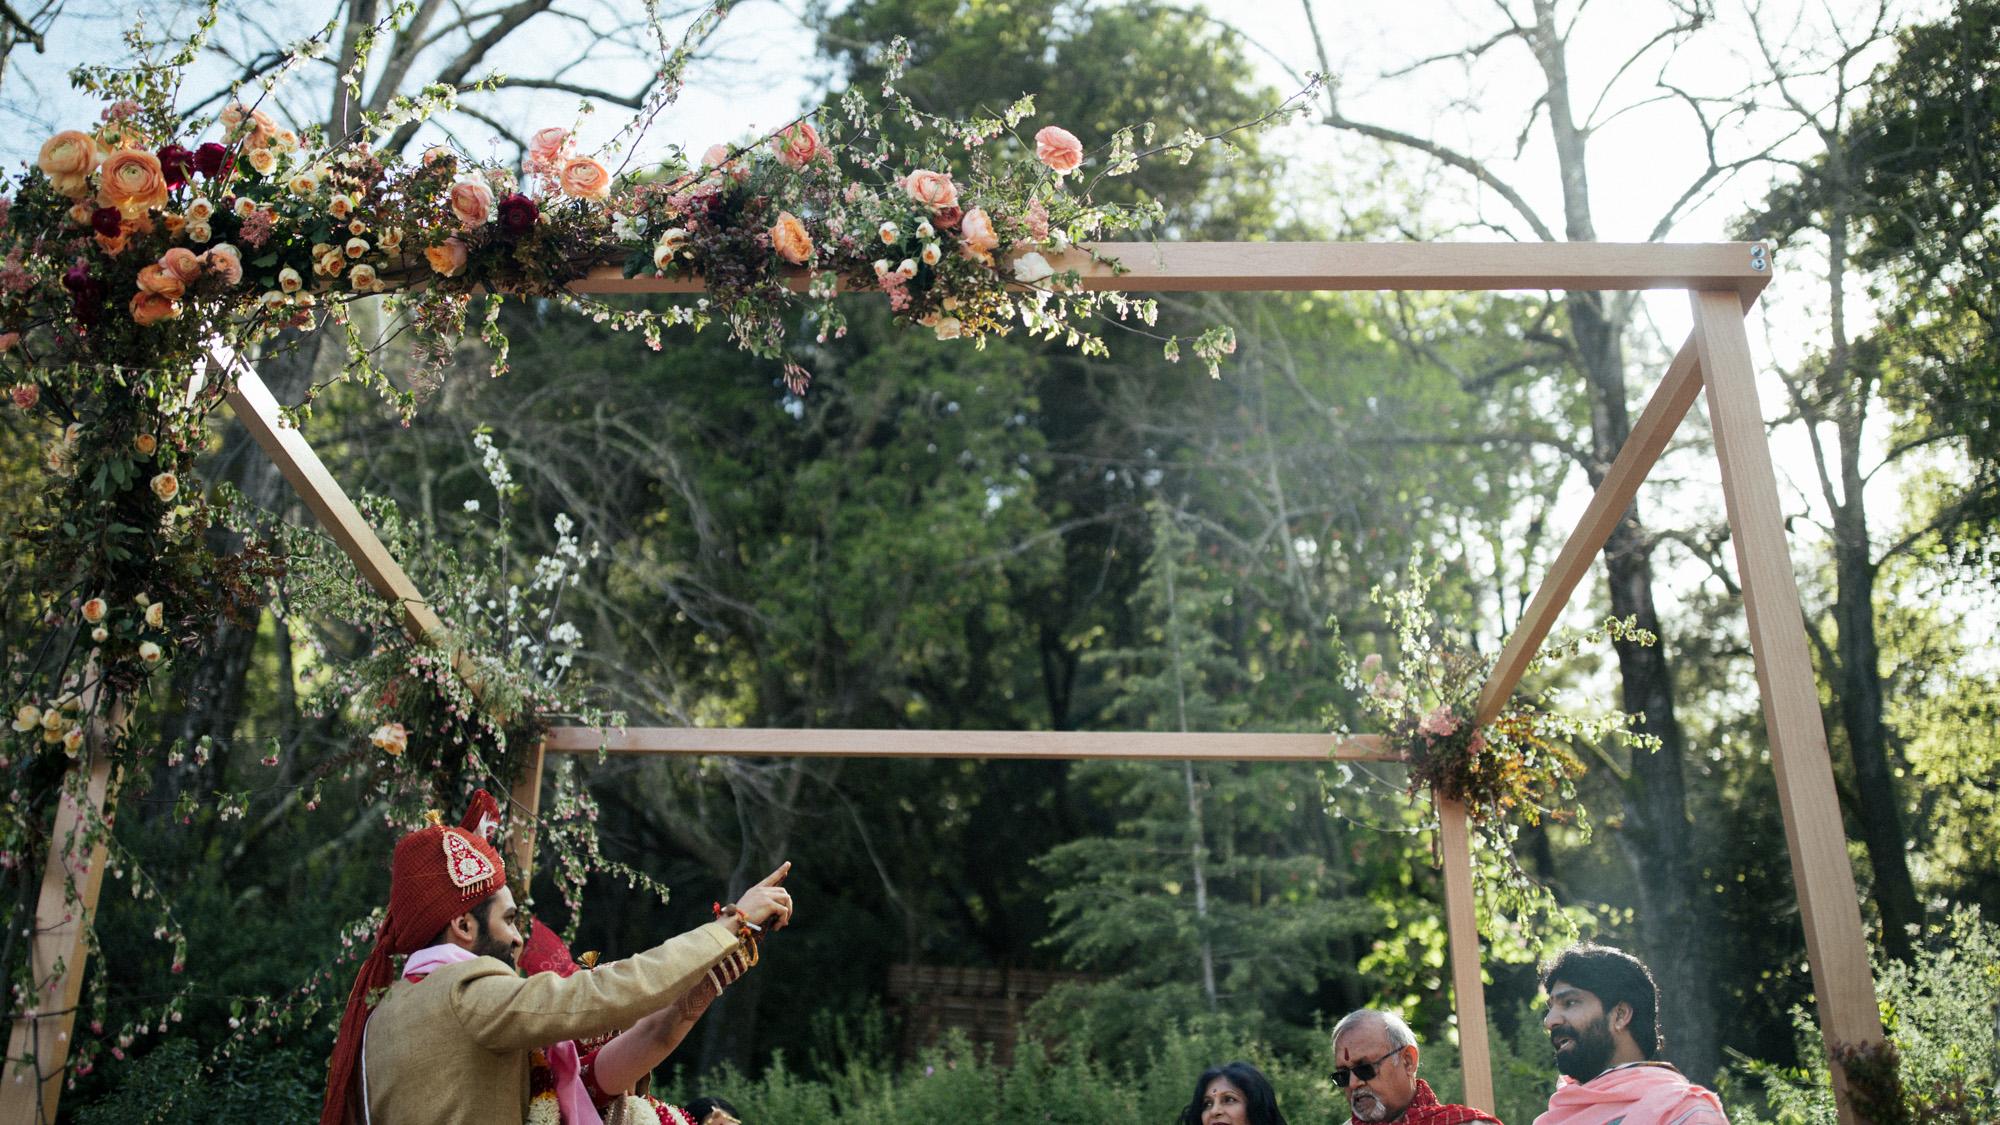 anu_maneesh_alec_vanderboom_Indian_wedding_photography-0114.jpg